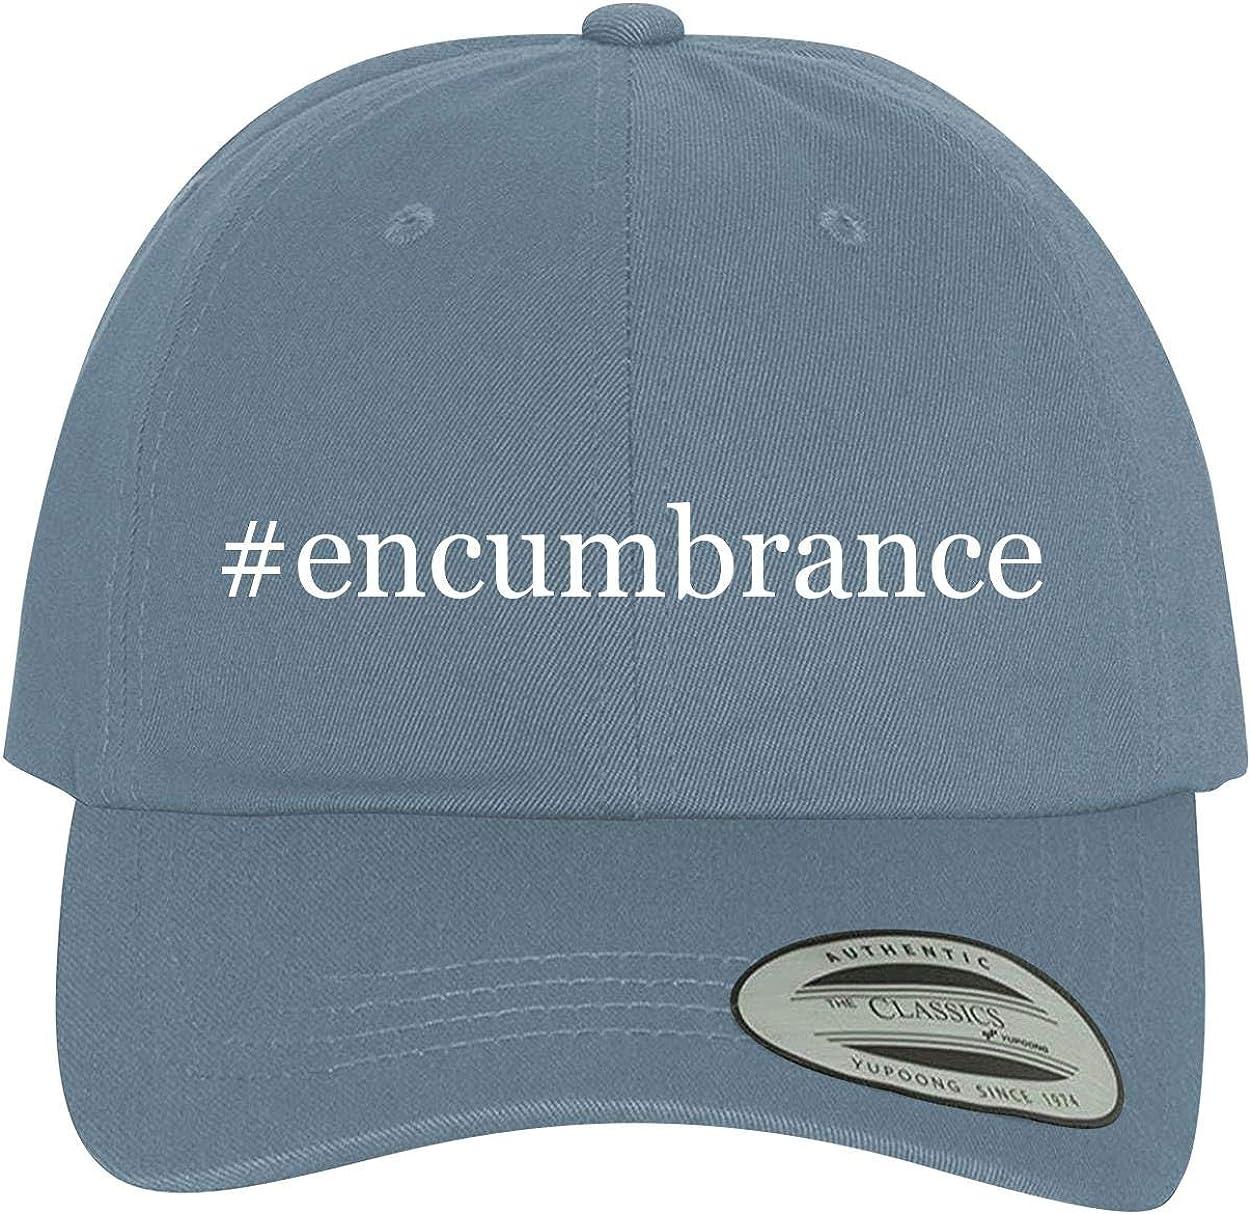 Comfortable Dad Hat Baseball Cap BH Cool Designs #Encumbrance